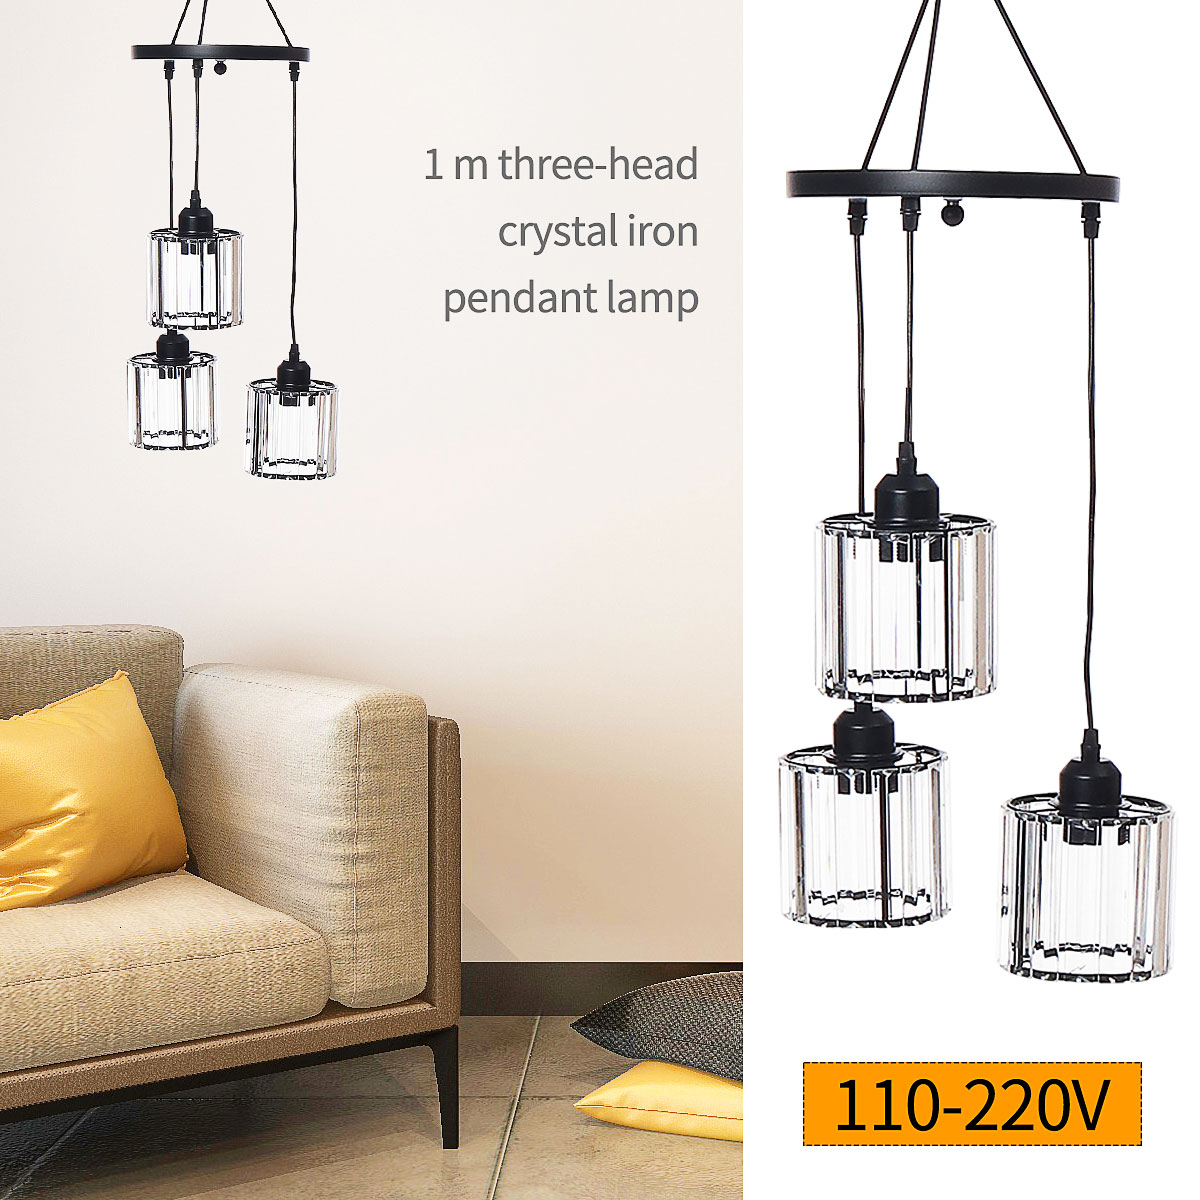 E26 E27 Modern Pendant Light 3 Head Iron Crystal Lamp Hallway Bedroom Home Bar Fixture Decoration Indoor Lighting 110-220V